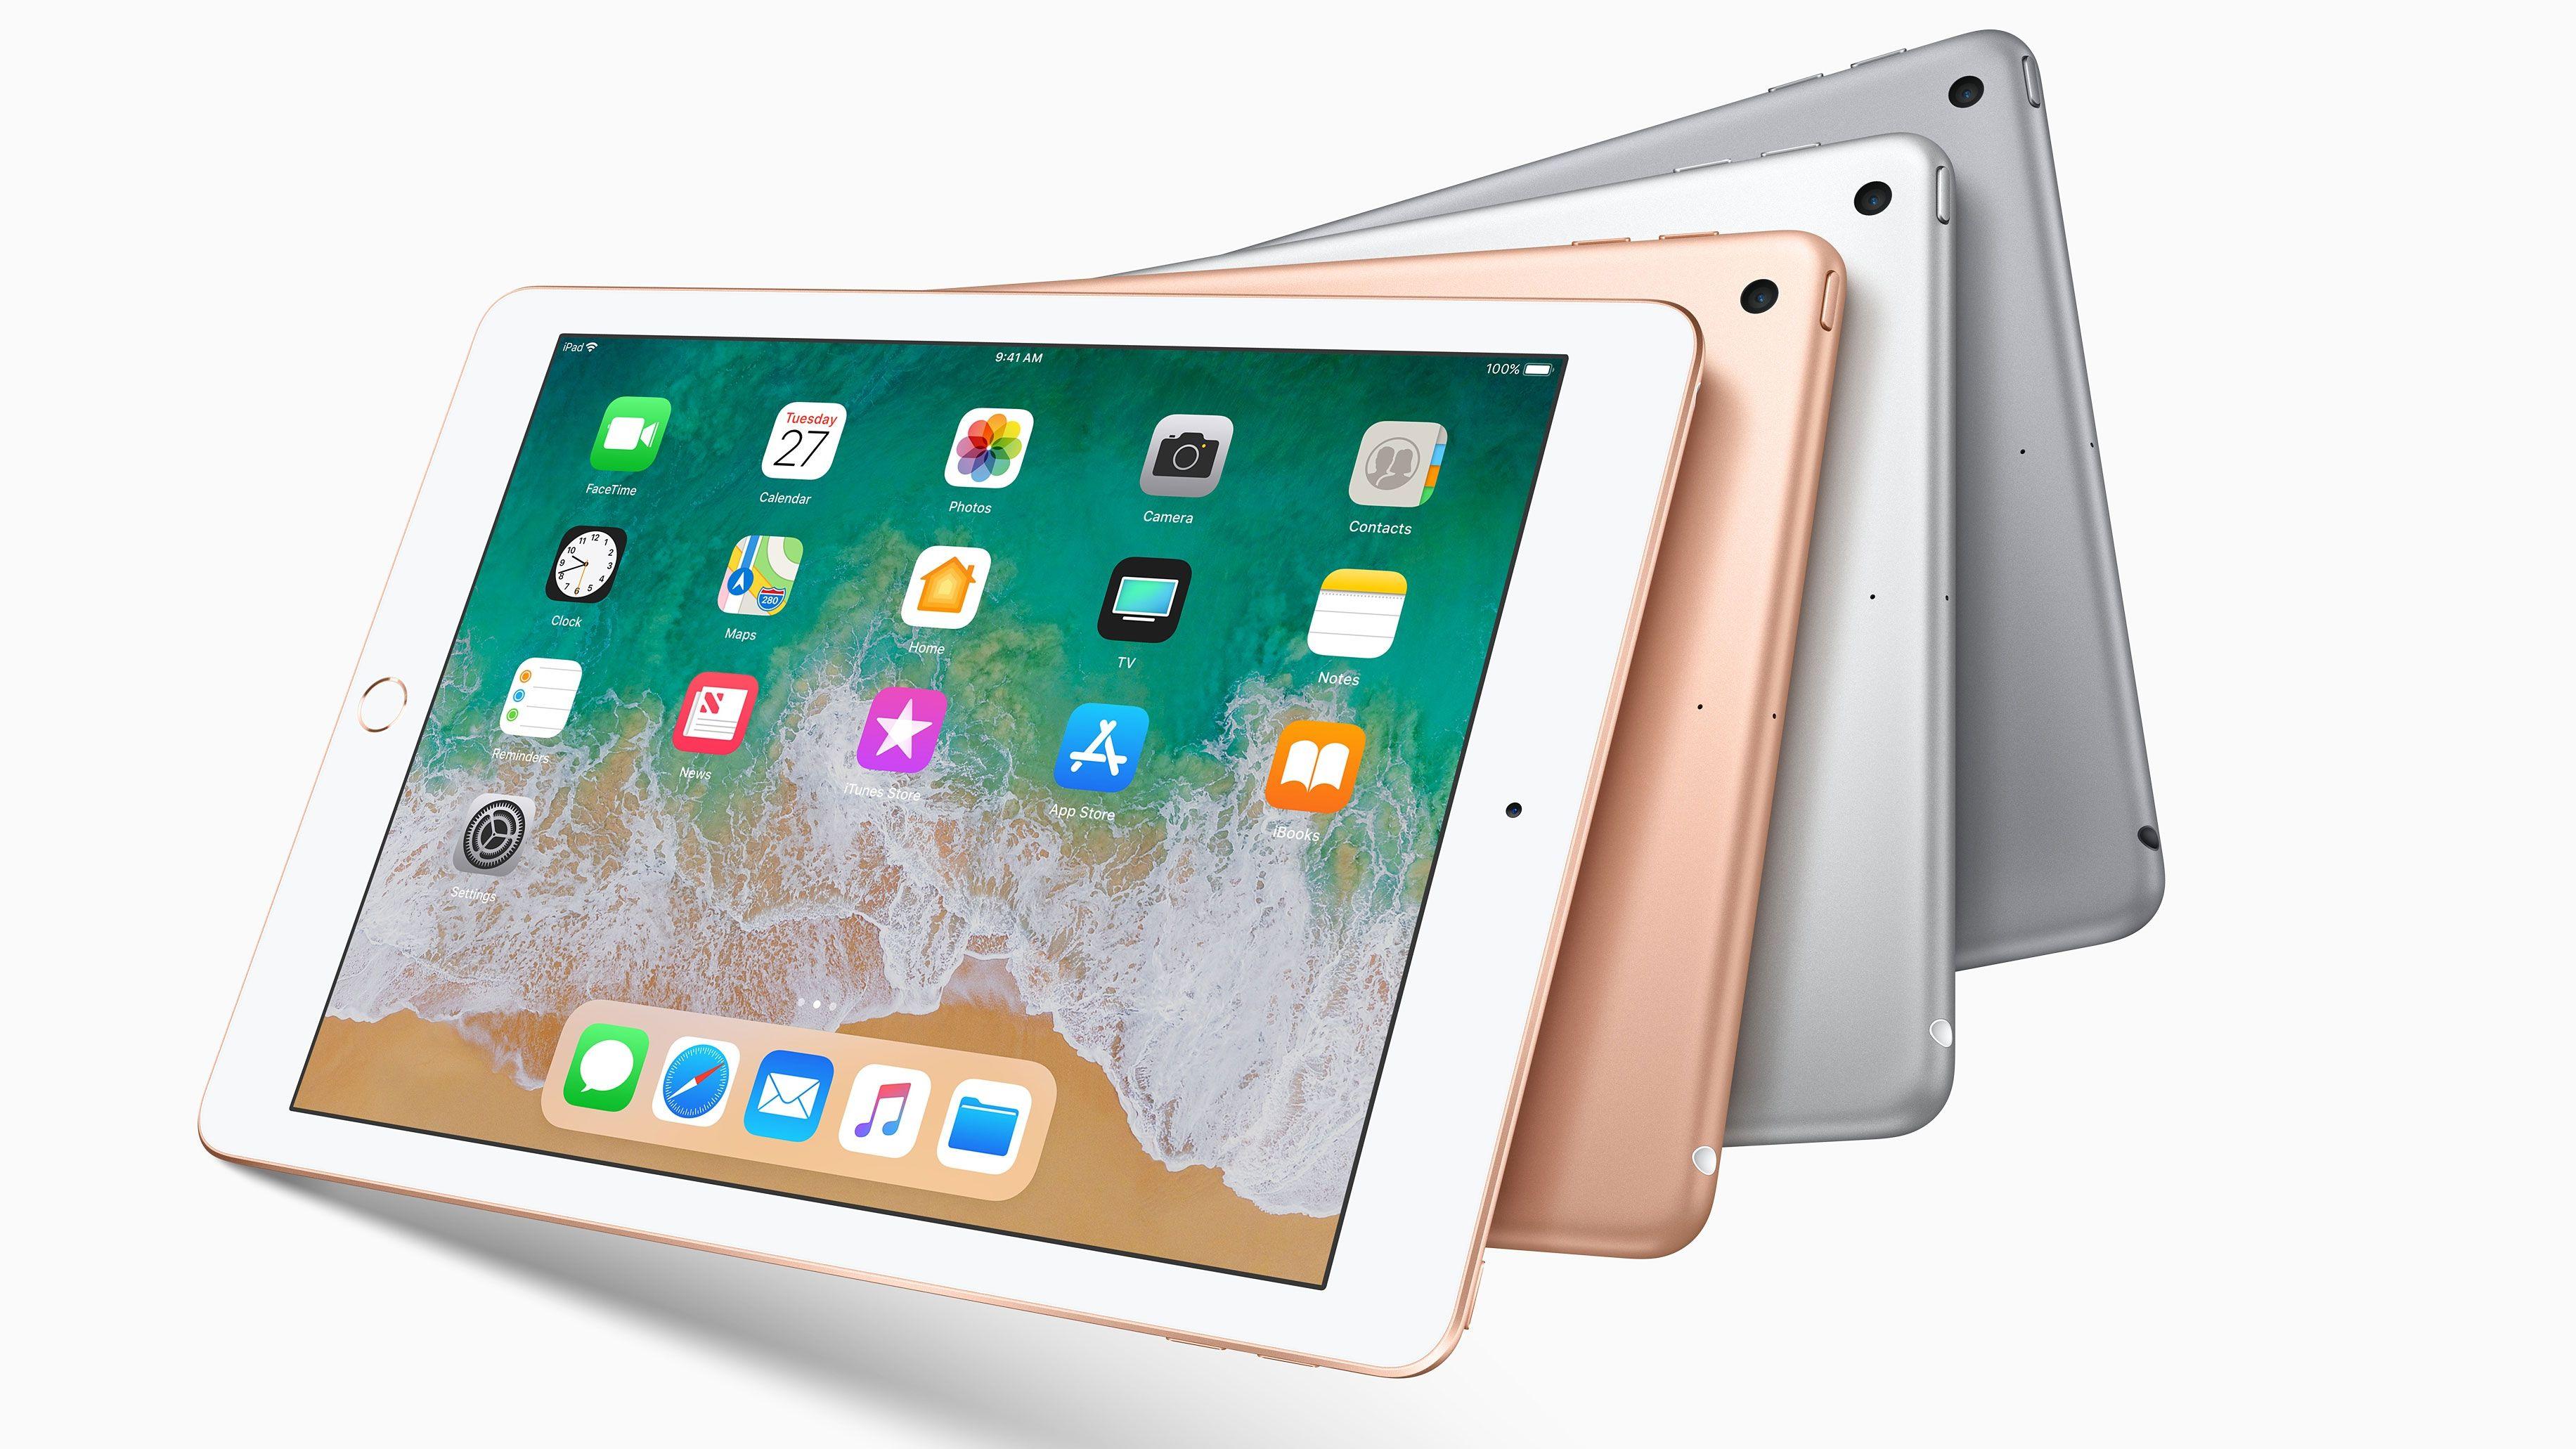 Ipad 2018 Now Available In The Uae Evanino Com Ipad Weben